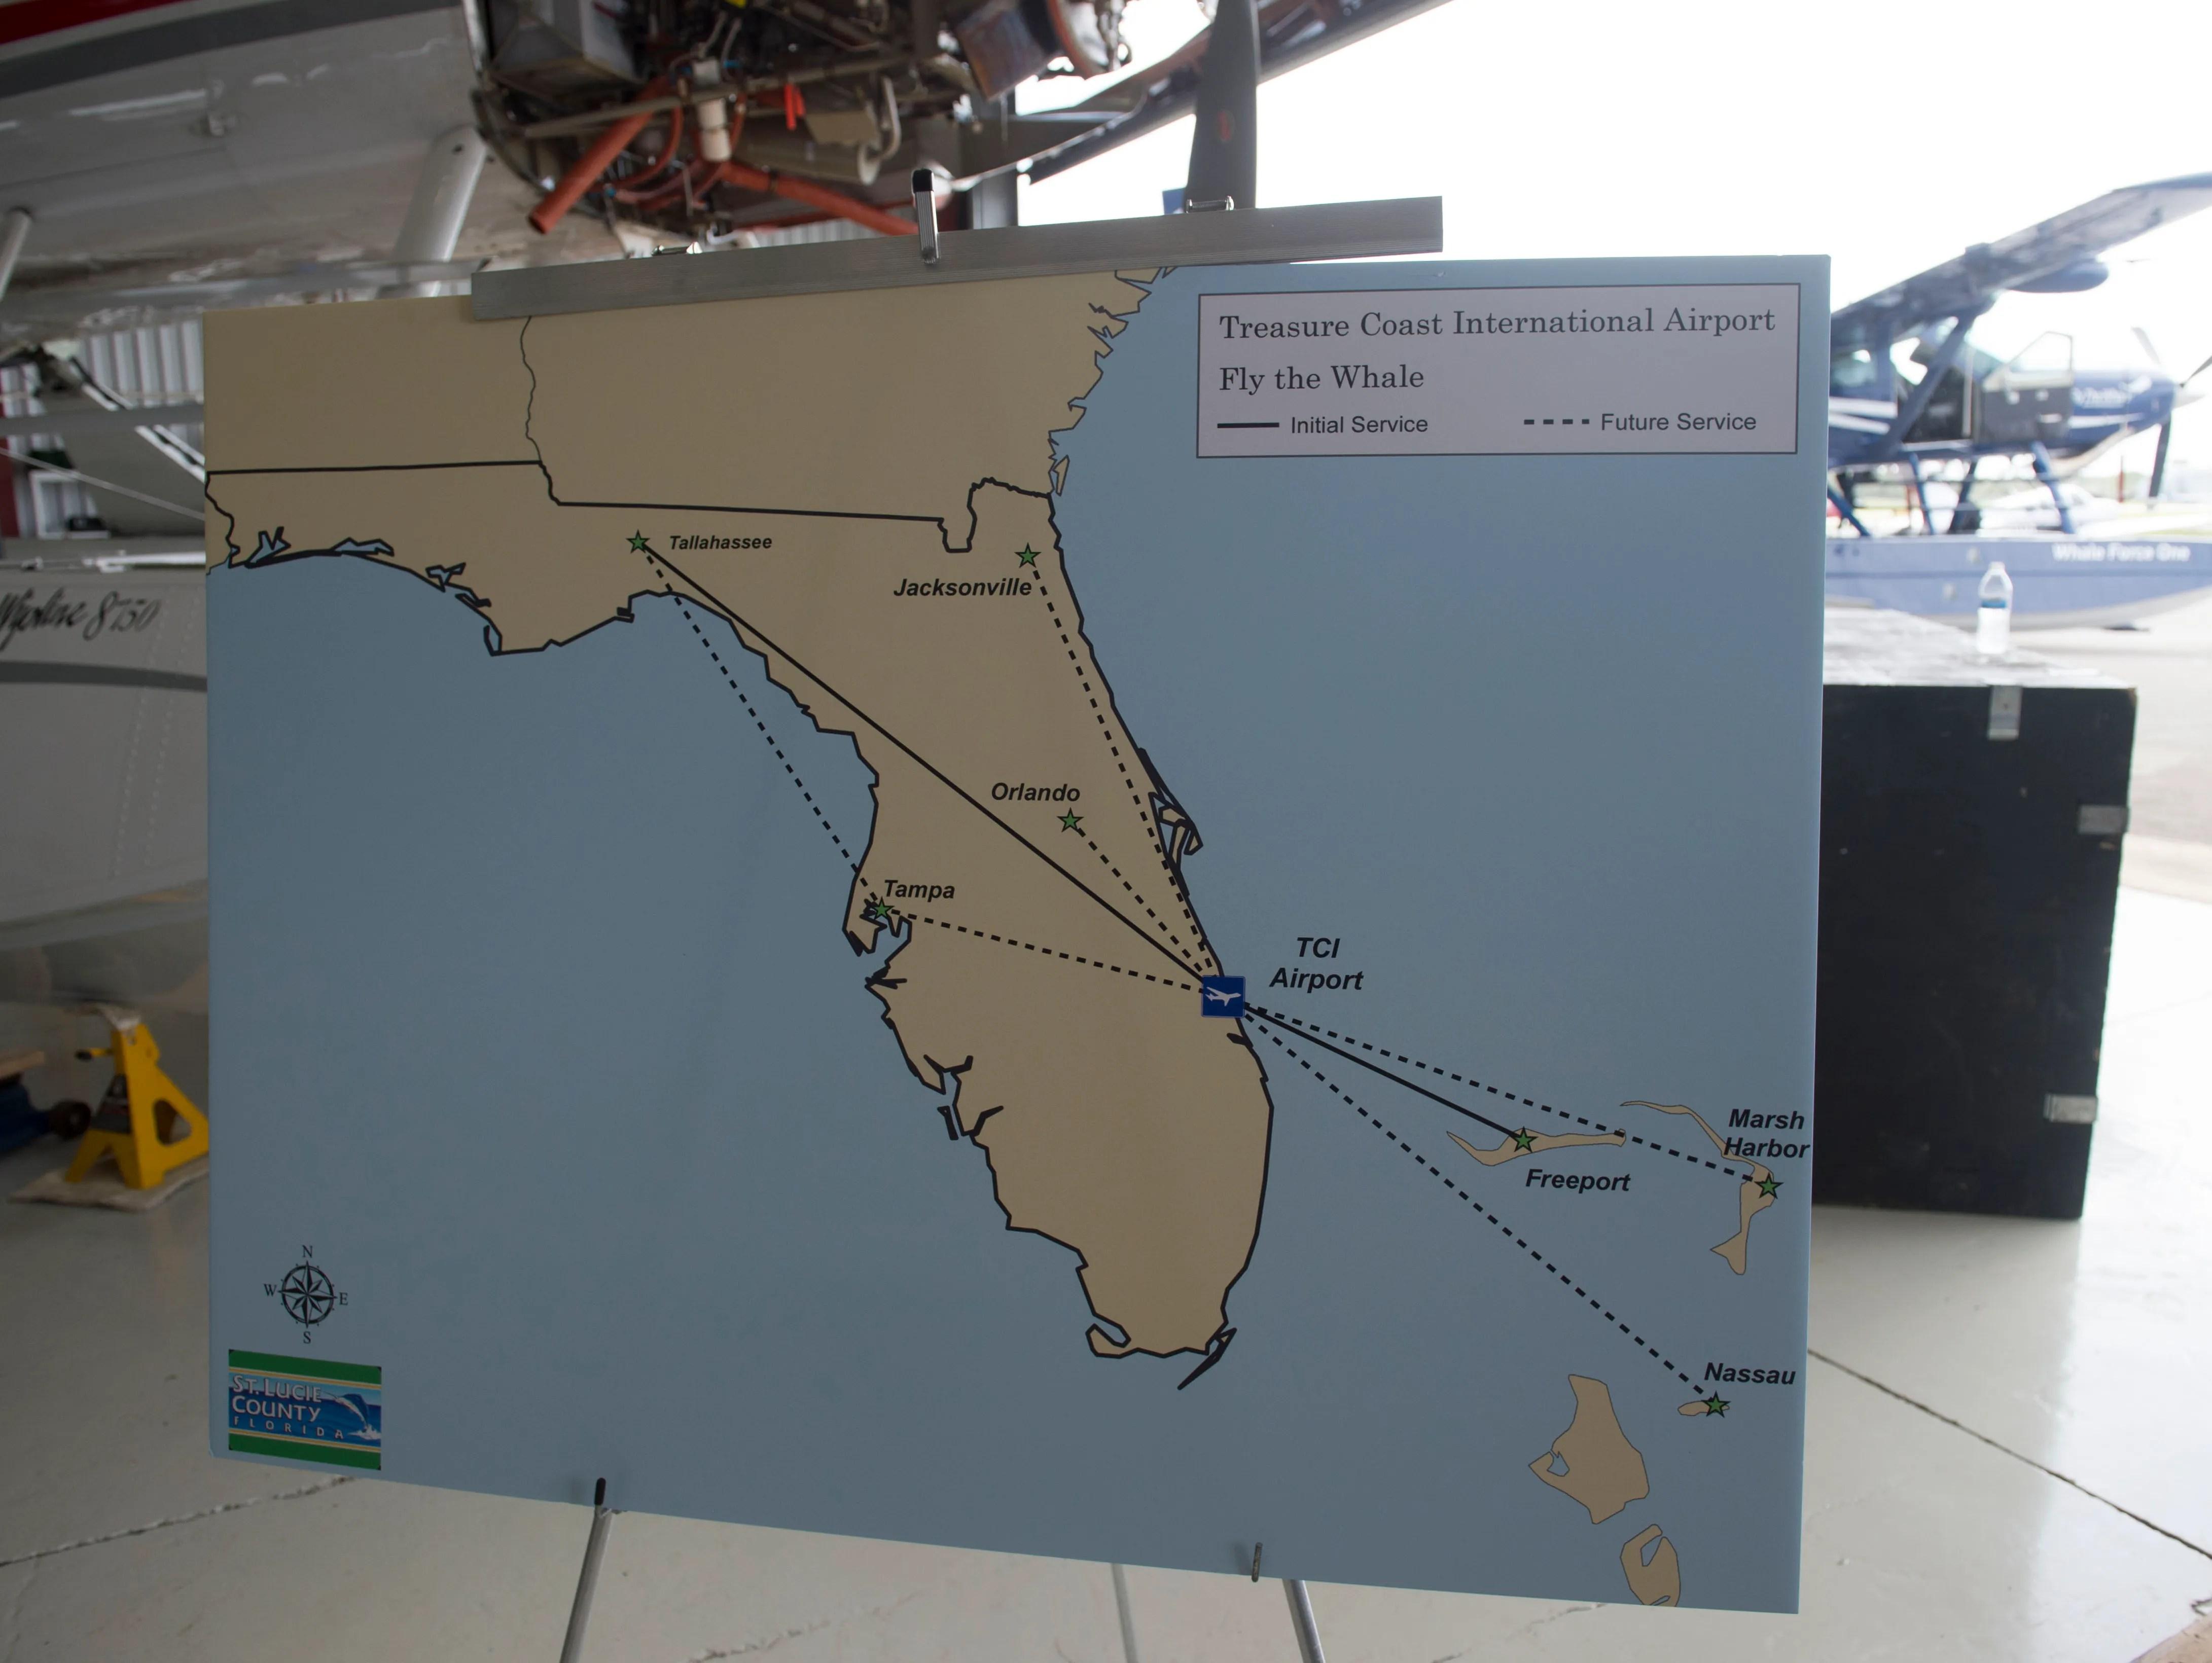 Fort Pierce Flights to the Bahamas